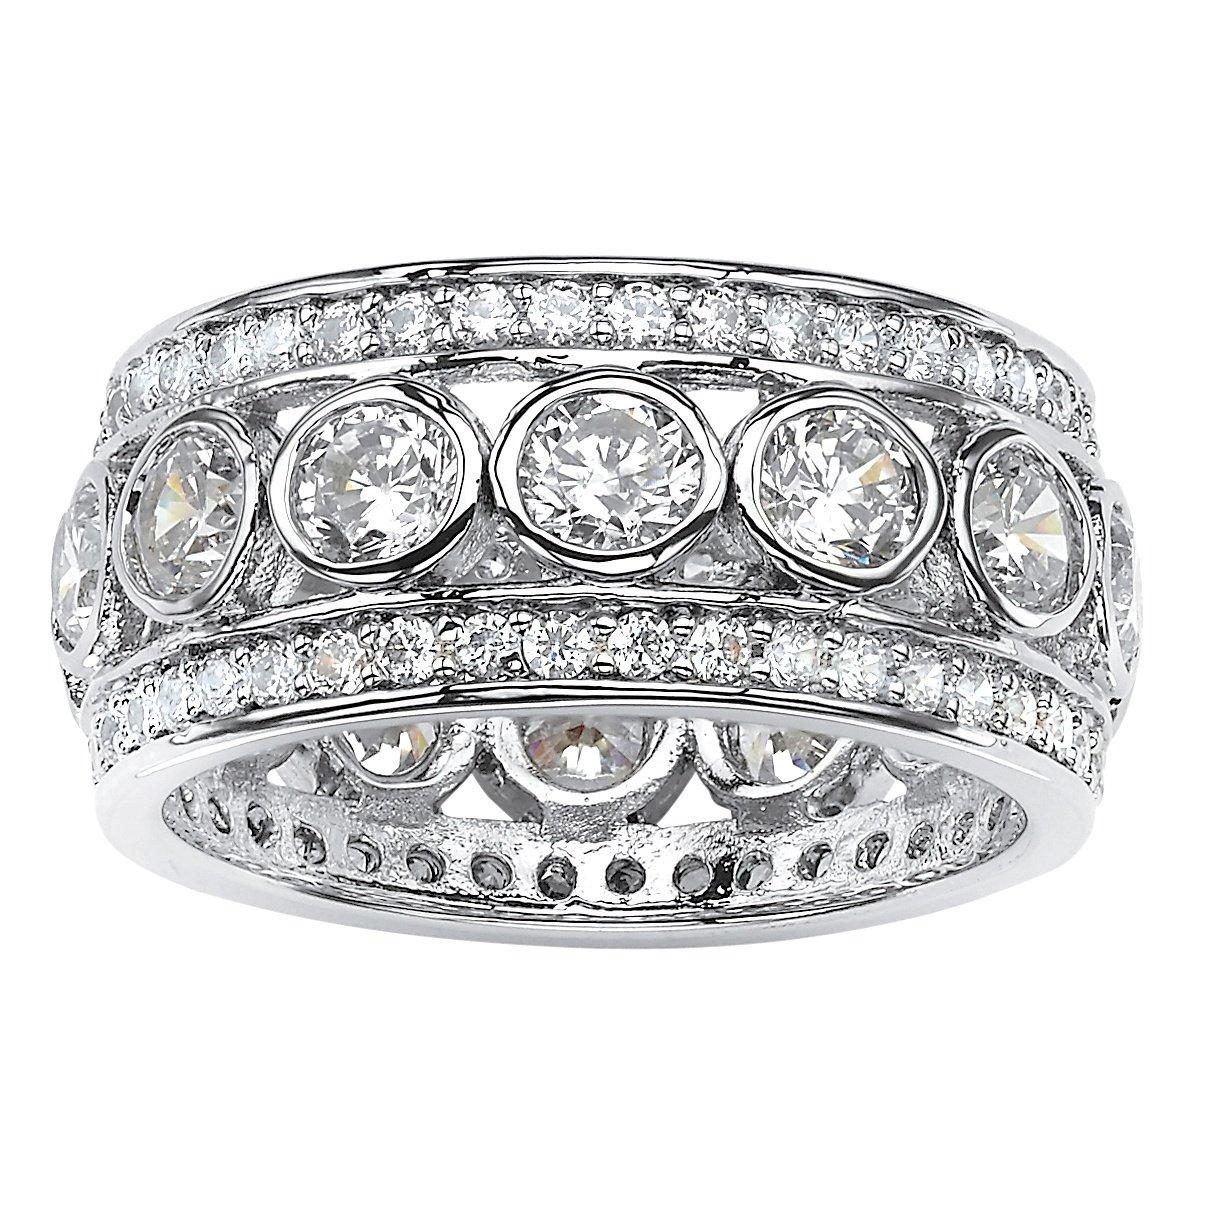 Round White Cubic Zirconia Platinum over .925 Silver Bezel-Set Triple-Row Eternity Ring Size 7